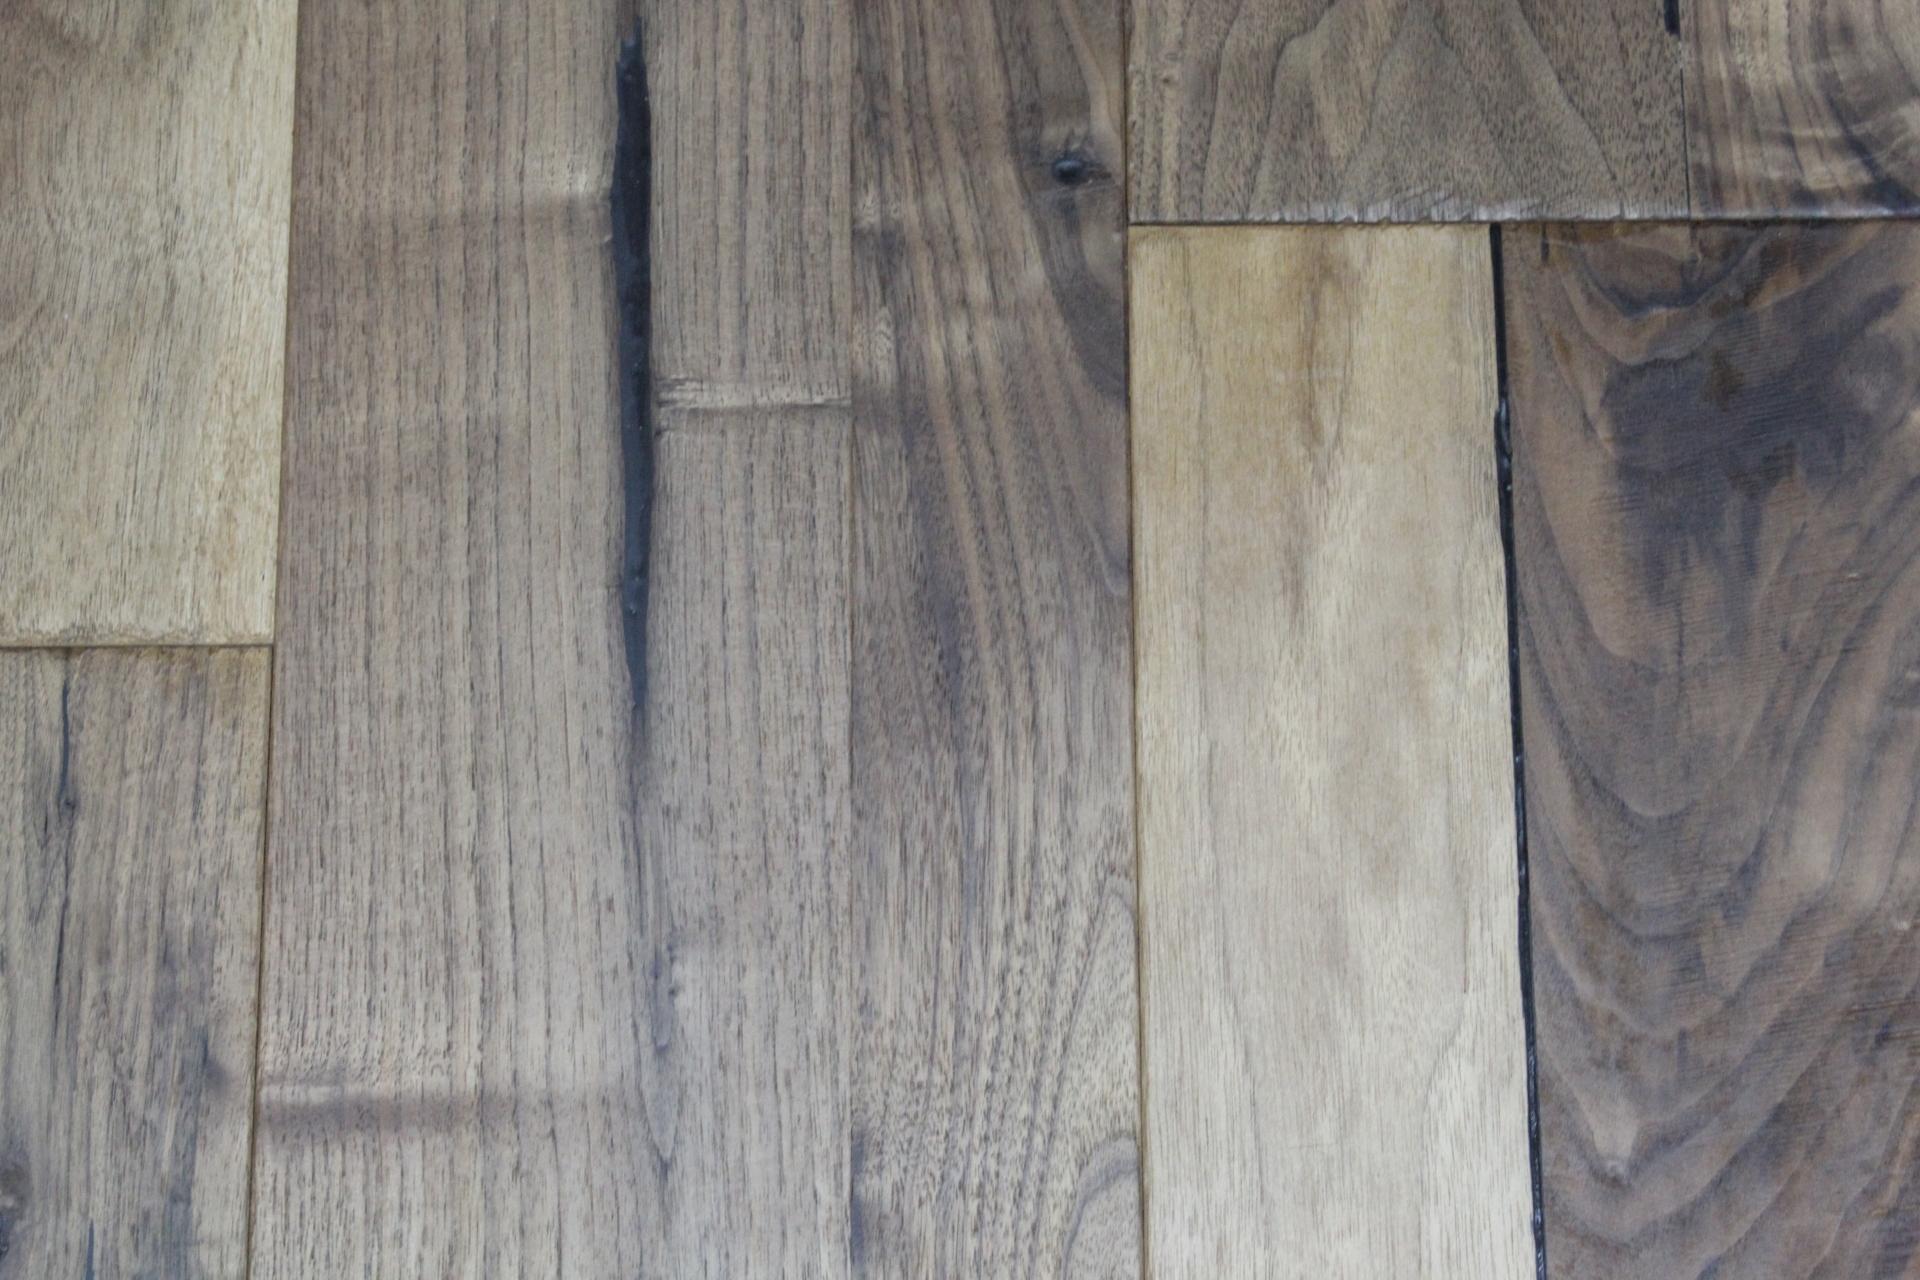 Hardwood, prefinished floor, engineered wood, solid wood, lifestyle, hard surface, prefinished hardwood, prefinished wood, home, design, interior design, wood floor design, hallmark floor